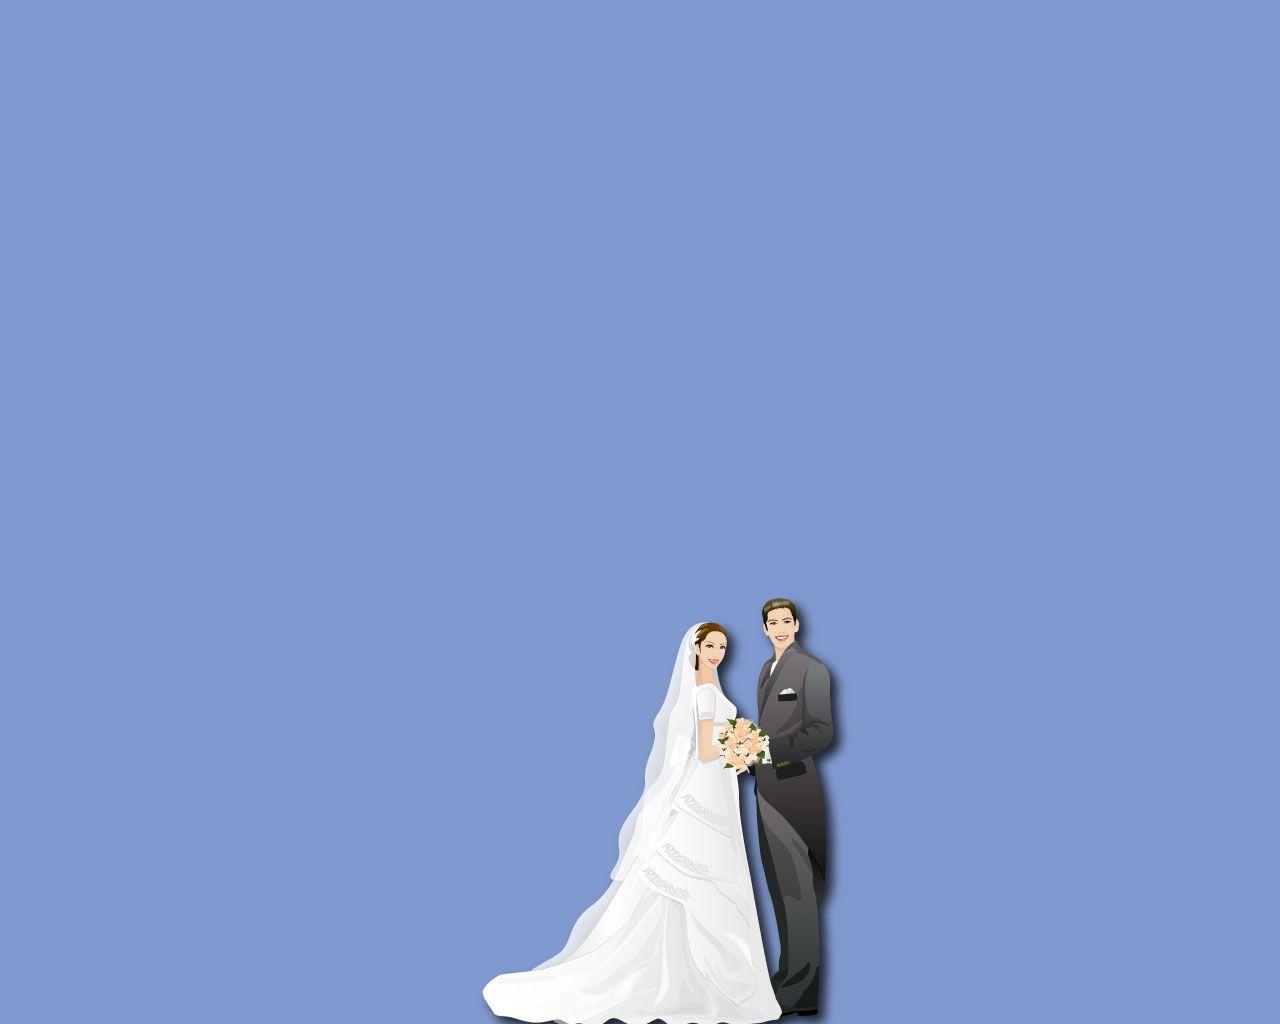 Birthday Video Background Free Download Free Wedding Background